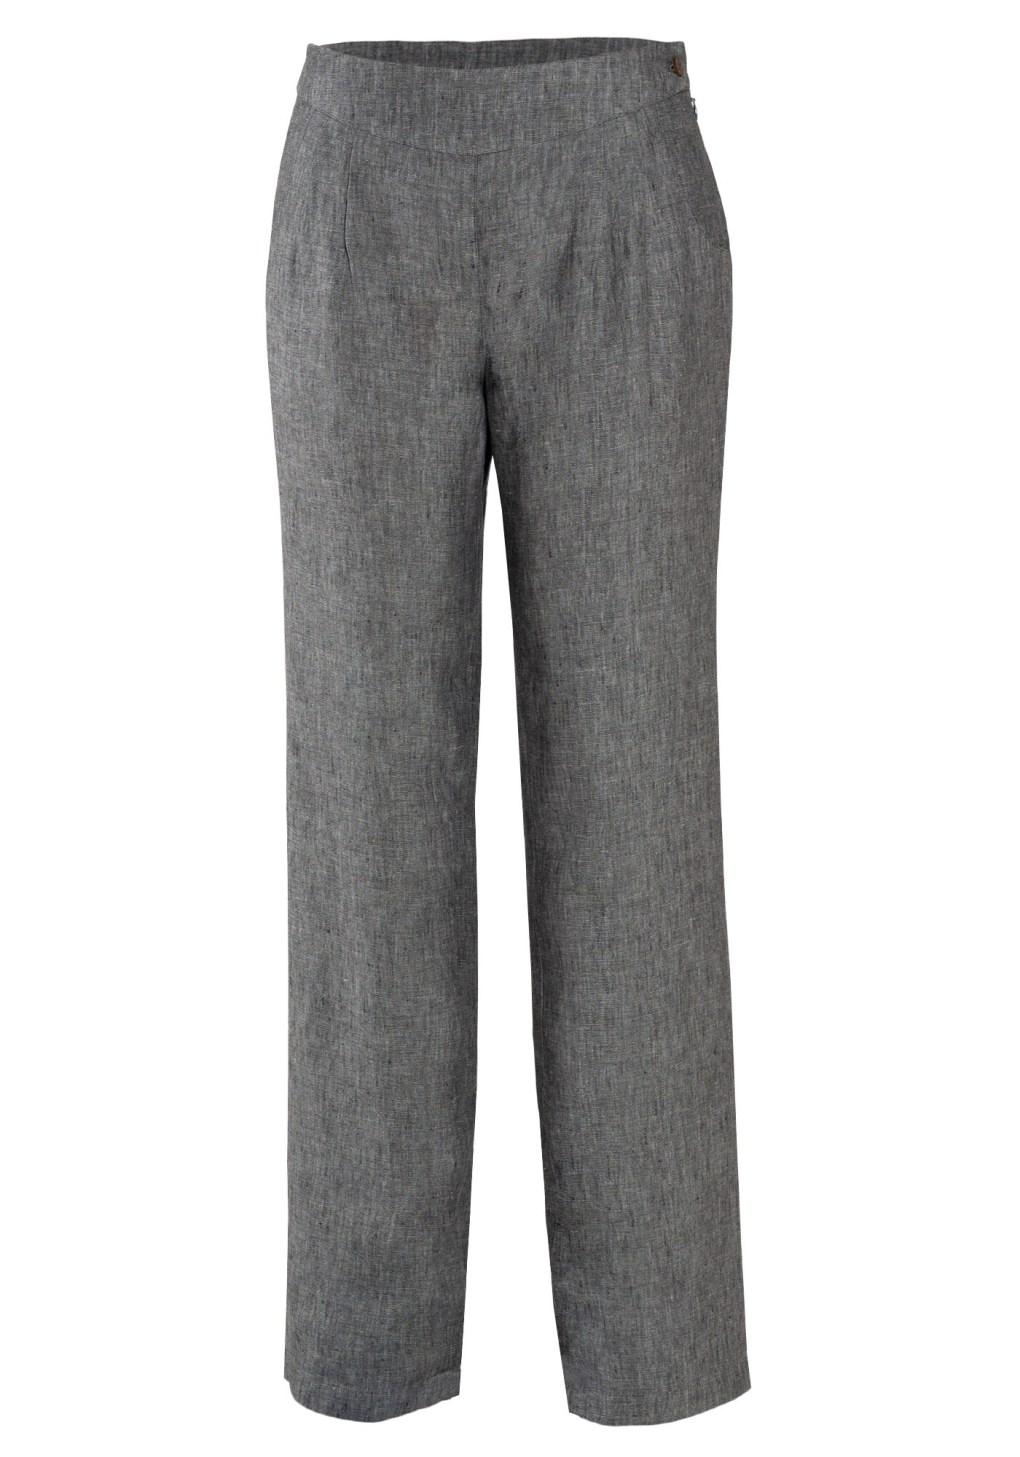 MINC Pleated Linen Trousers in Frost Grey